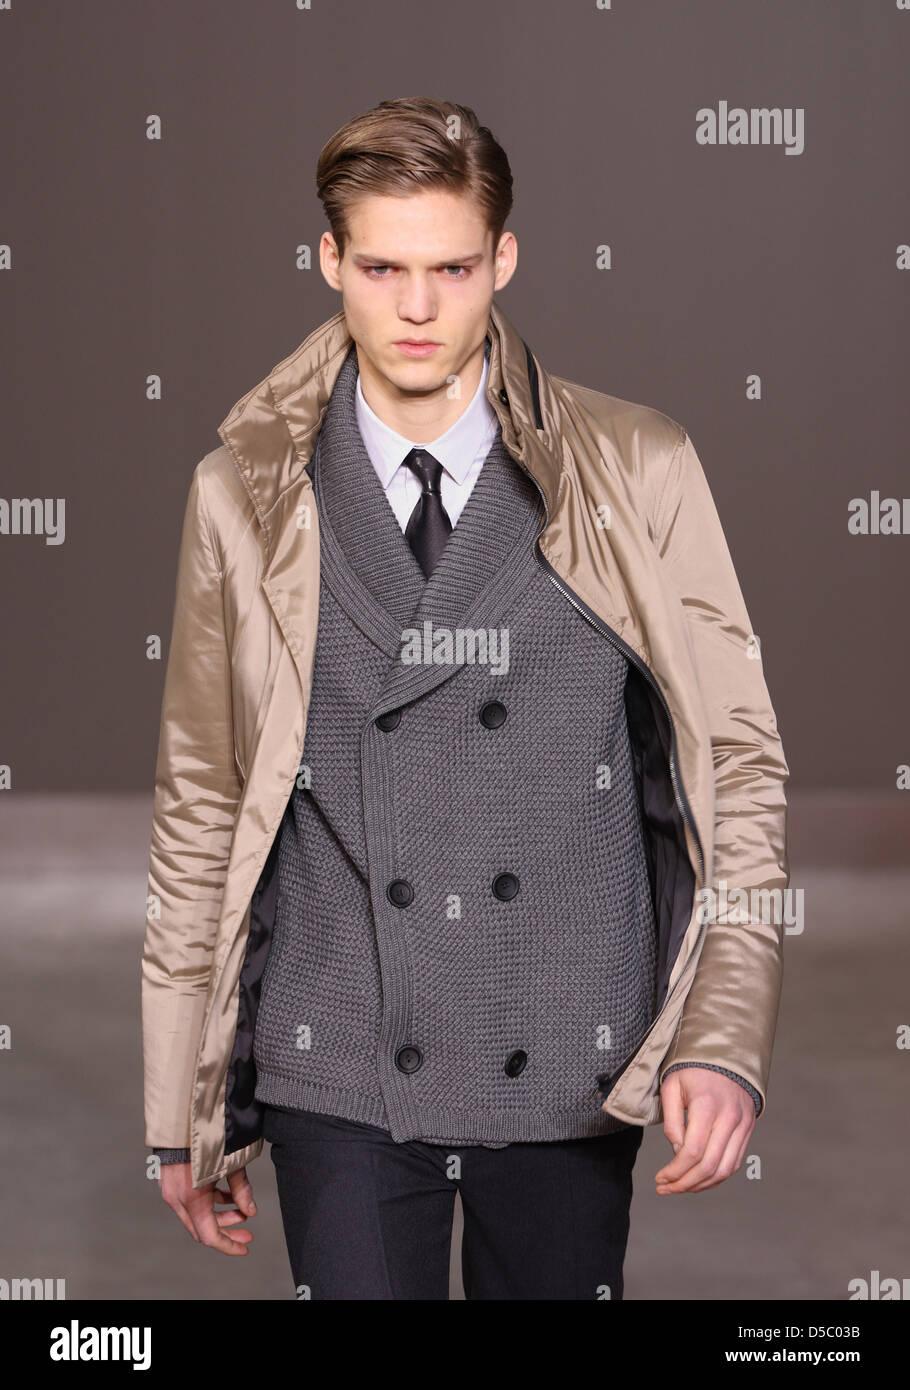 Un modelo luce una creación como parte de Louis Vuitton la moda masculina otoño invierno 2010-11 colección presentada Foto de stock